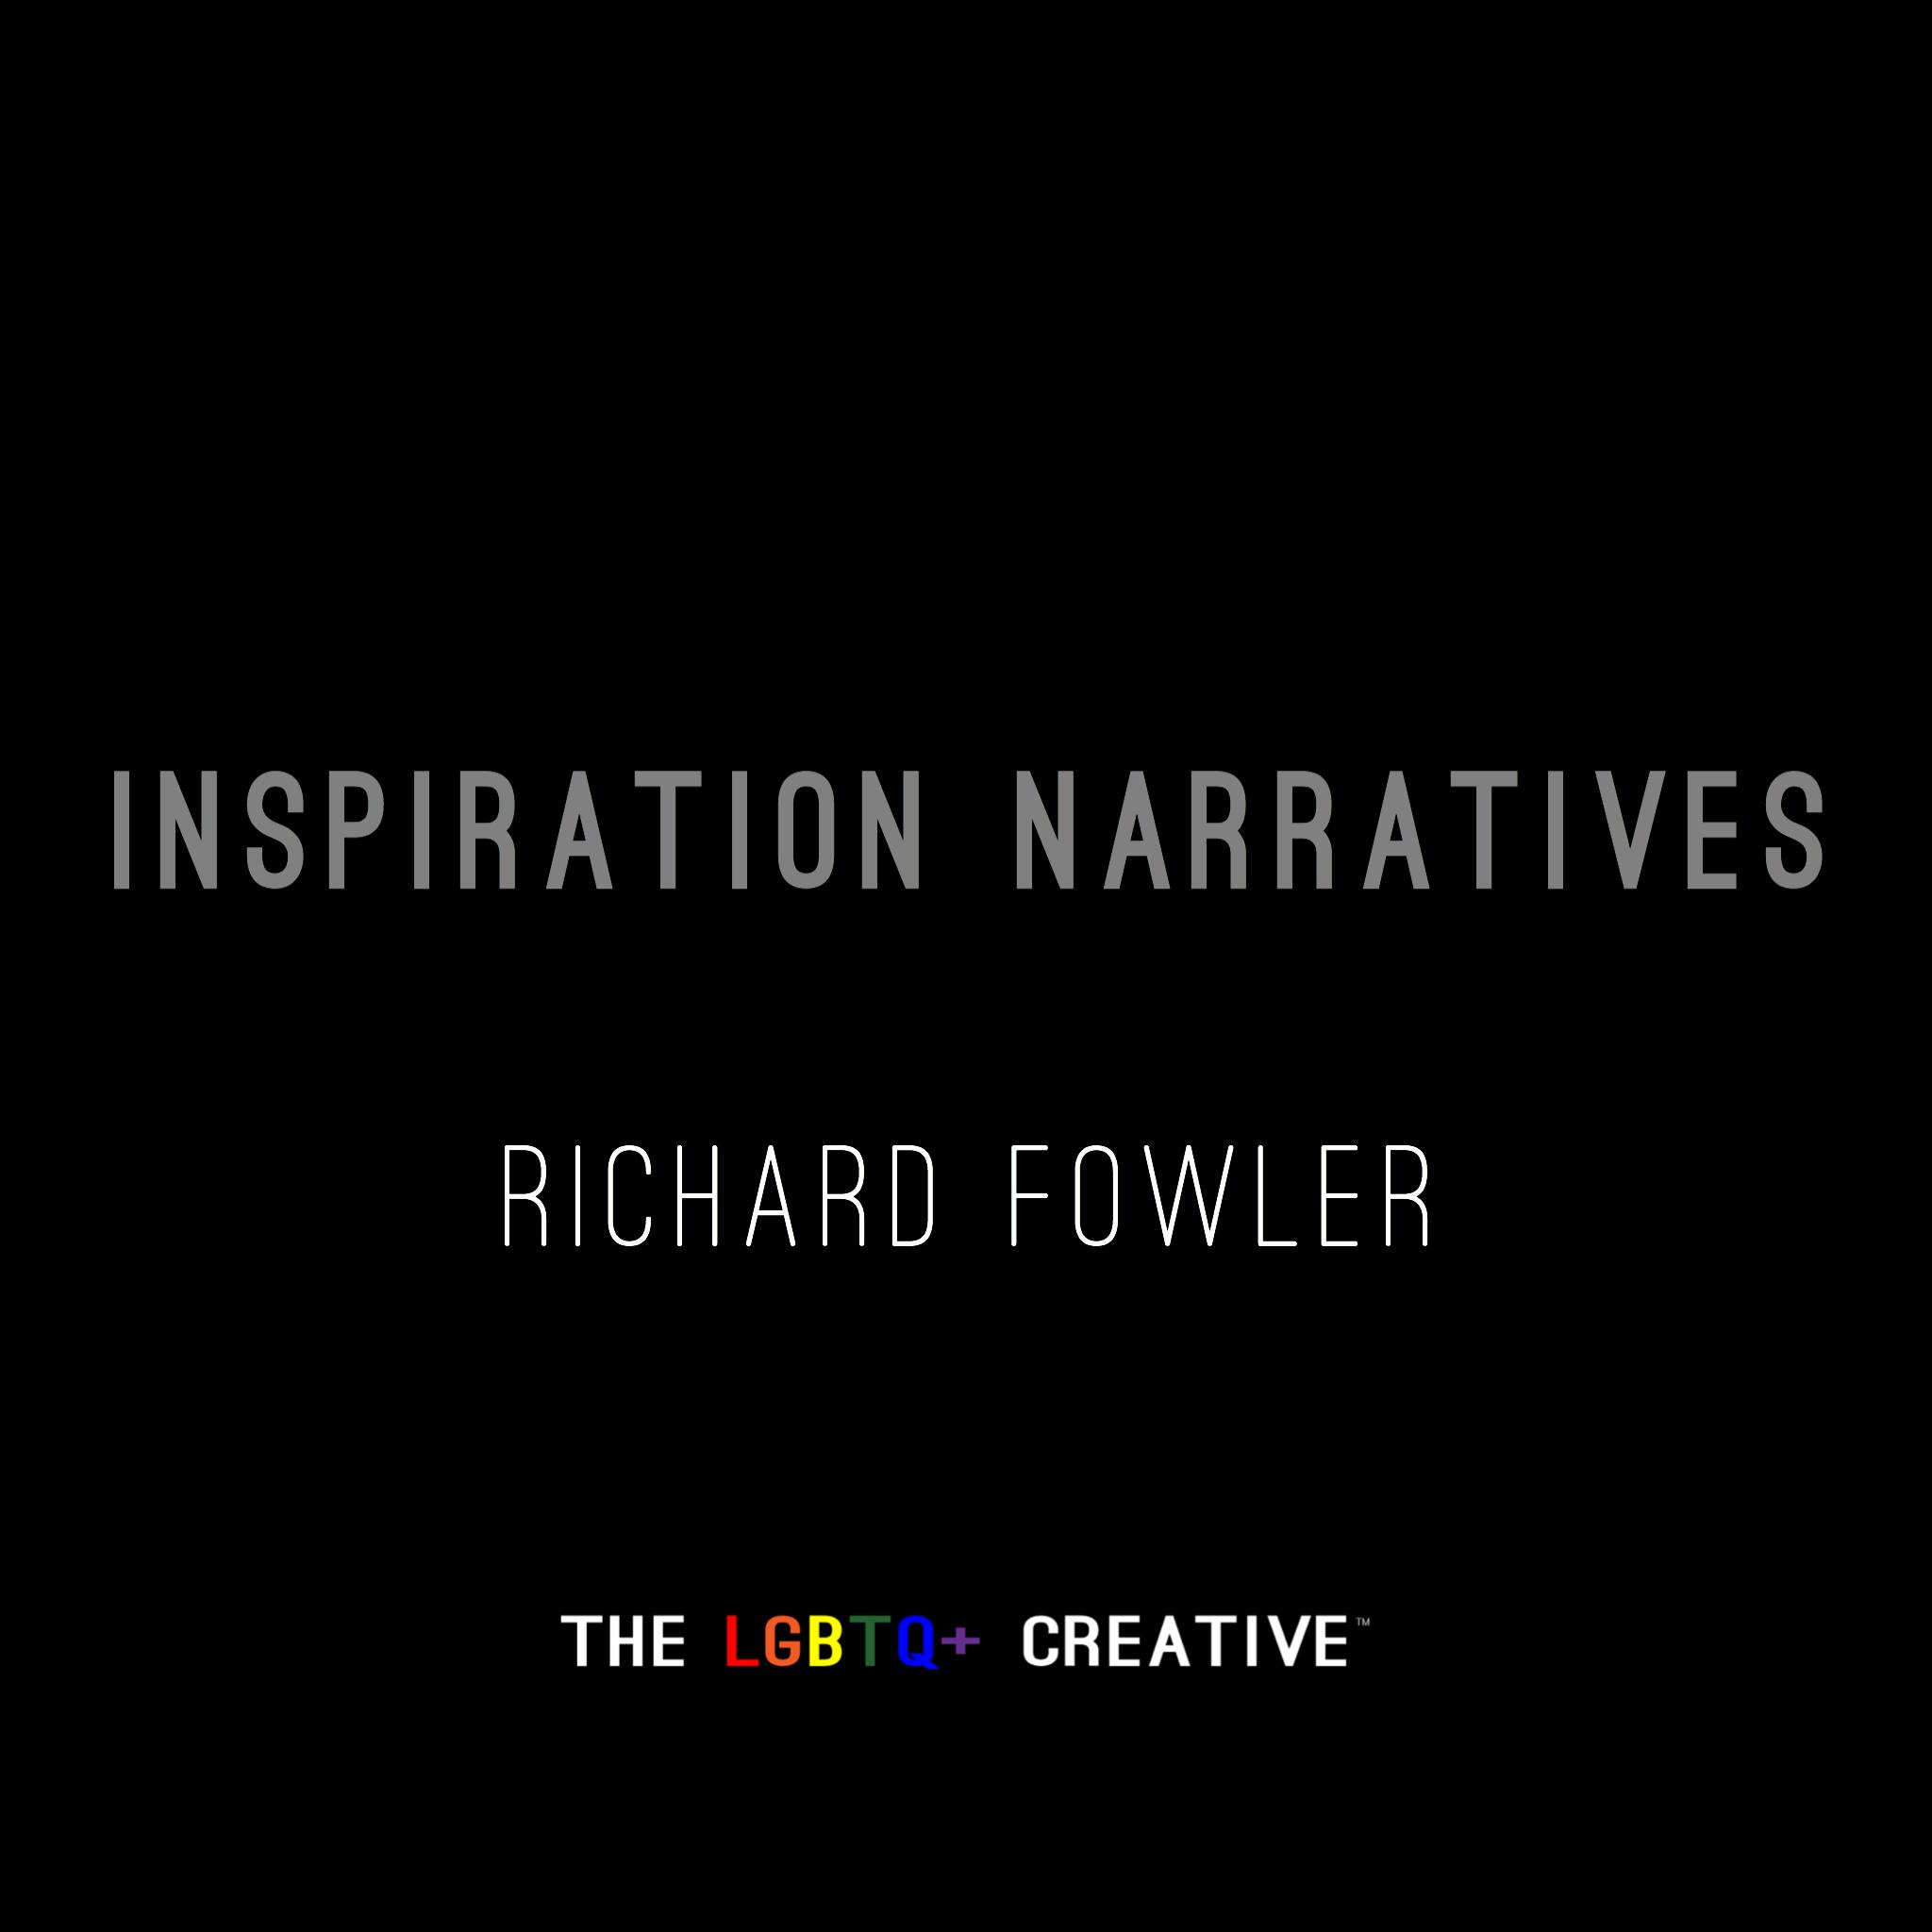 Inspiration Narratives - Richard Fowler